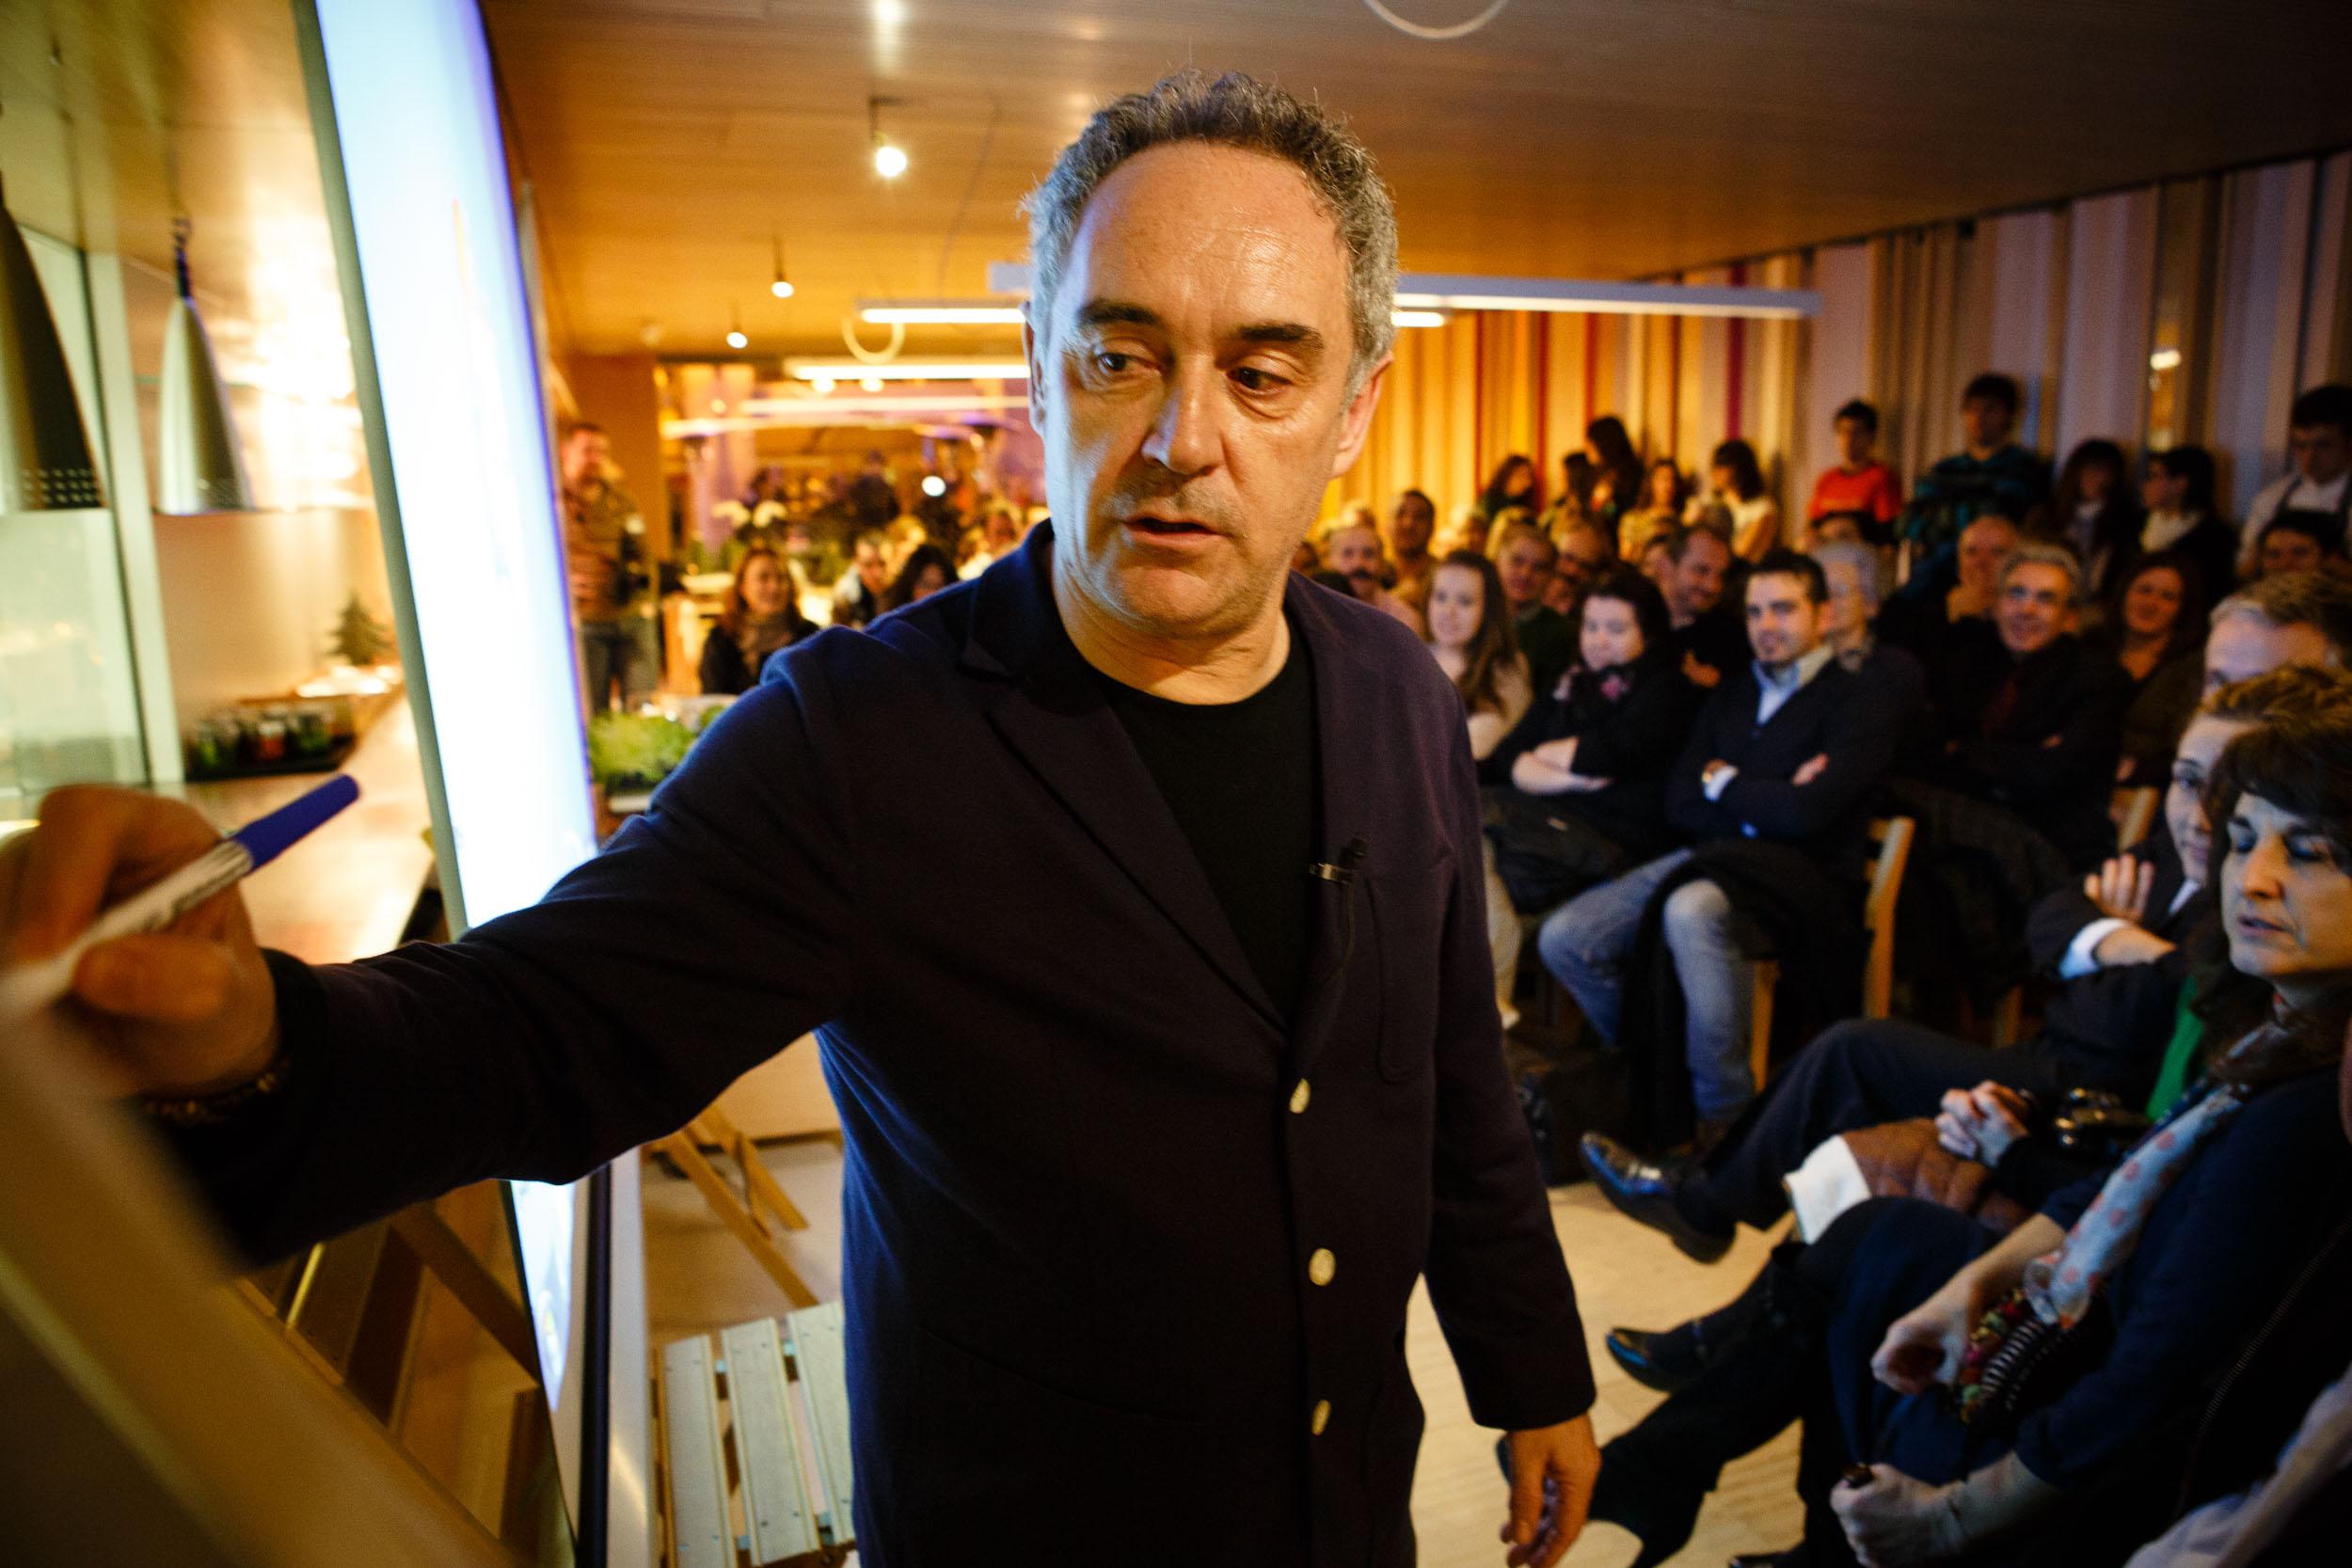 14/12/12 Ferran Adrià en Restaurante Tondeluna, Logroño, La Rioja. Foto por James Sturcke | www.sturcke.org